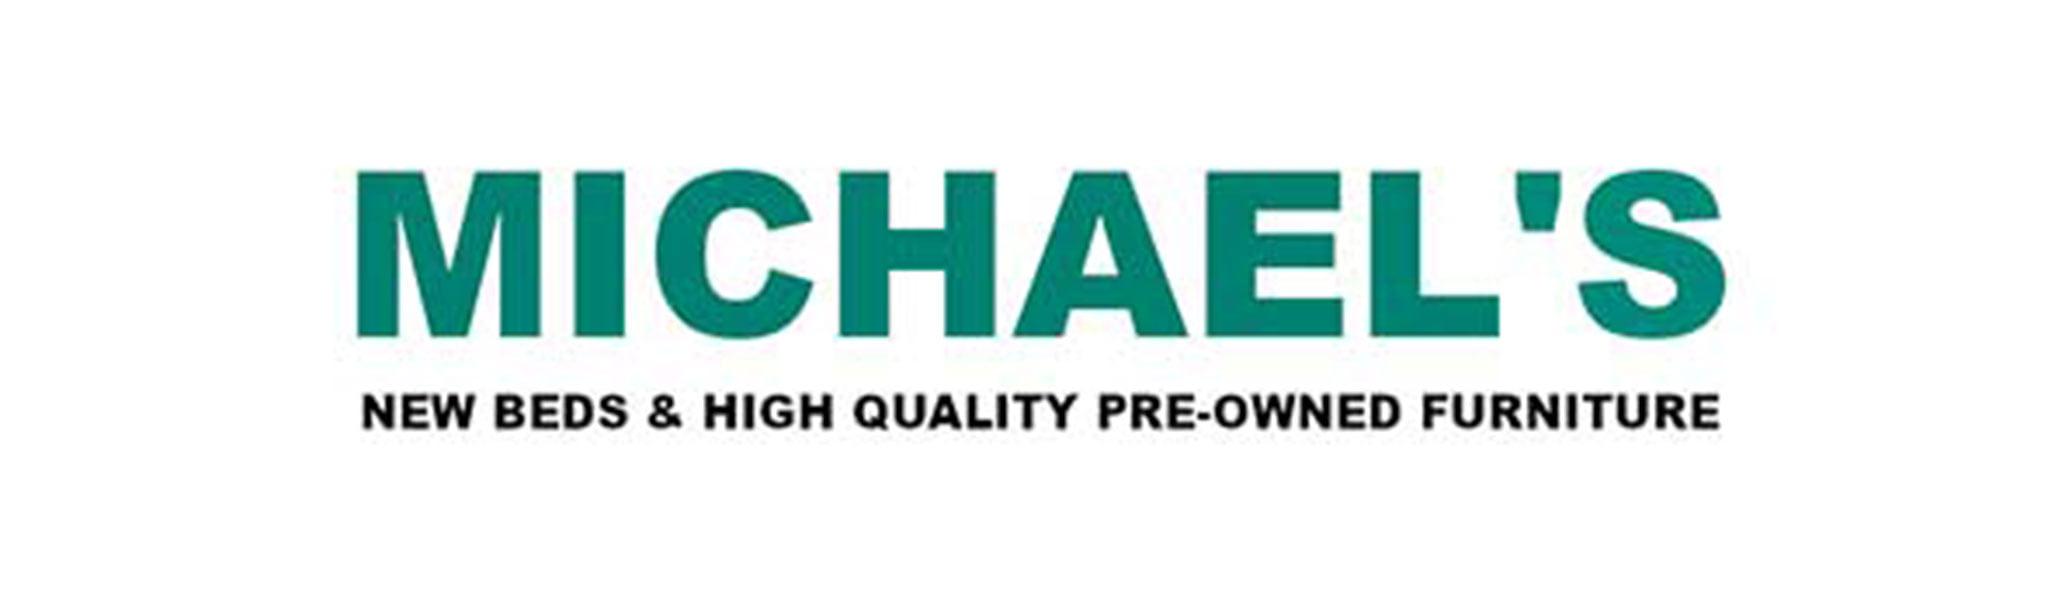 Logotipo MICHAEL'S